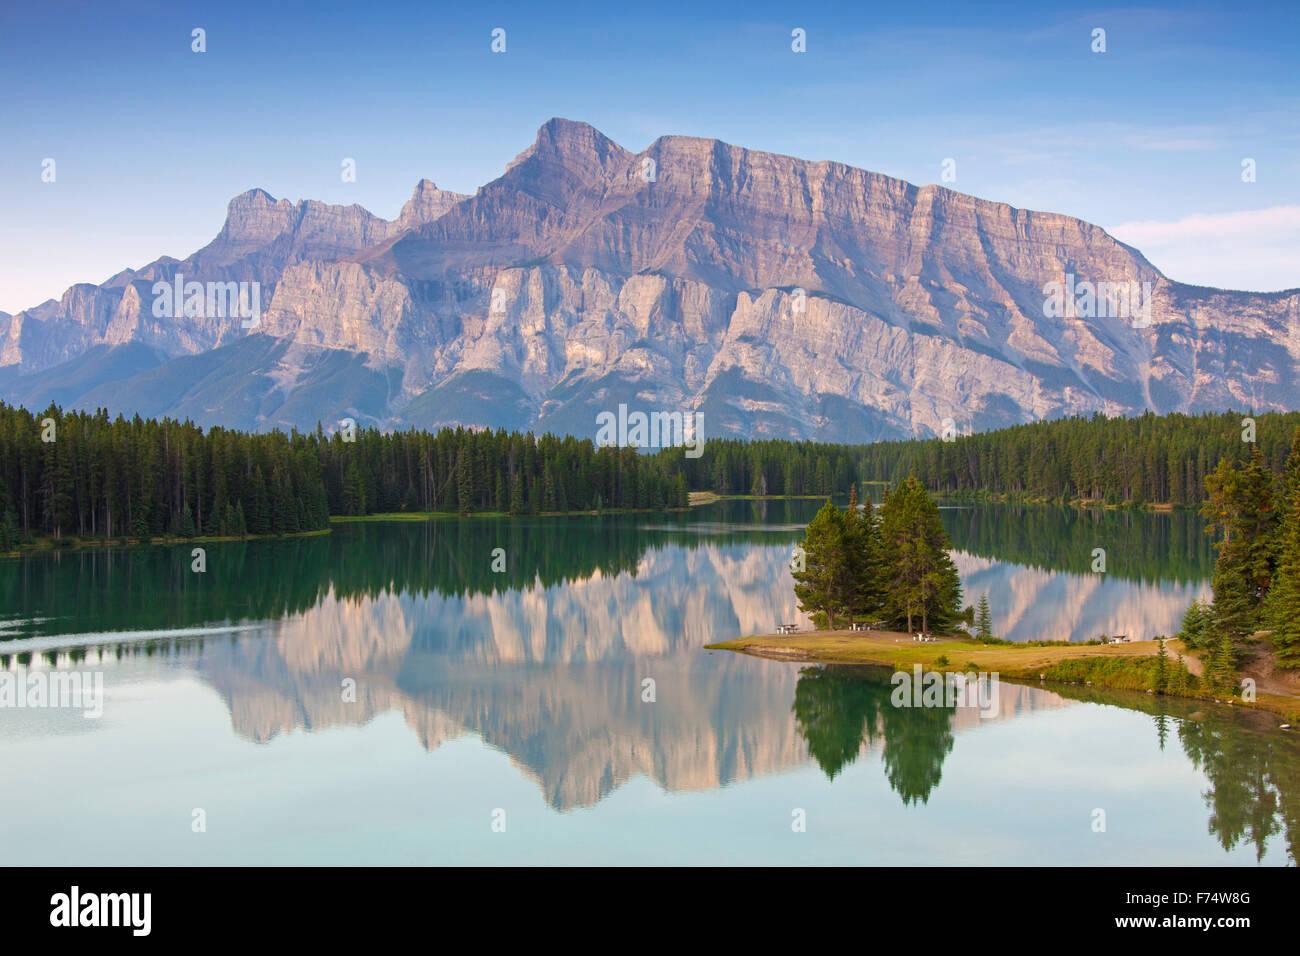 Le mont Rundle et le lac Two Jack, Banff National Park, Alberta, Canada, Canadian Rockies Photo Stock